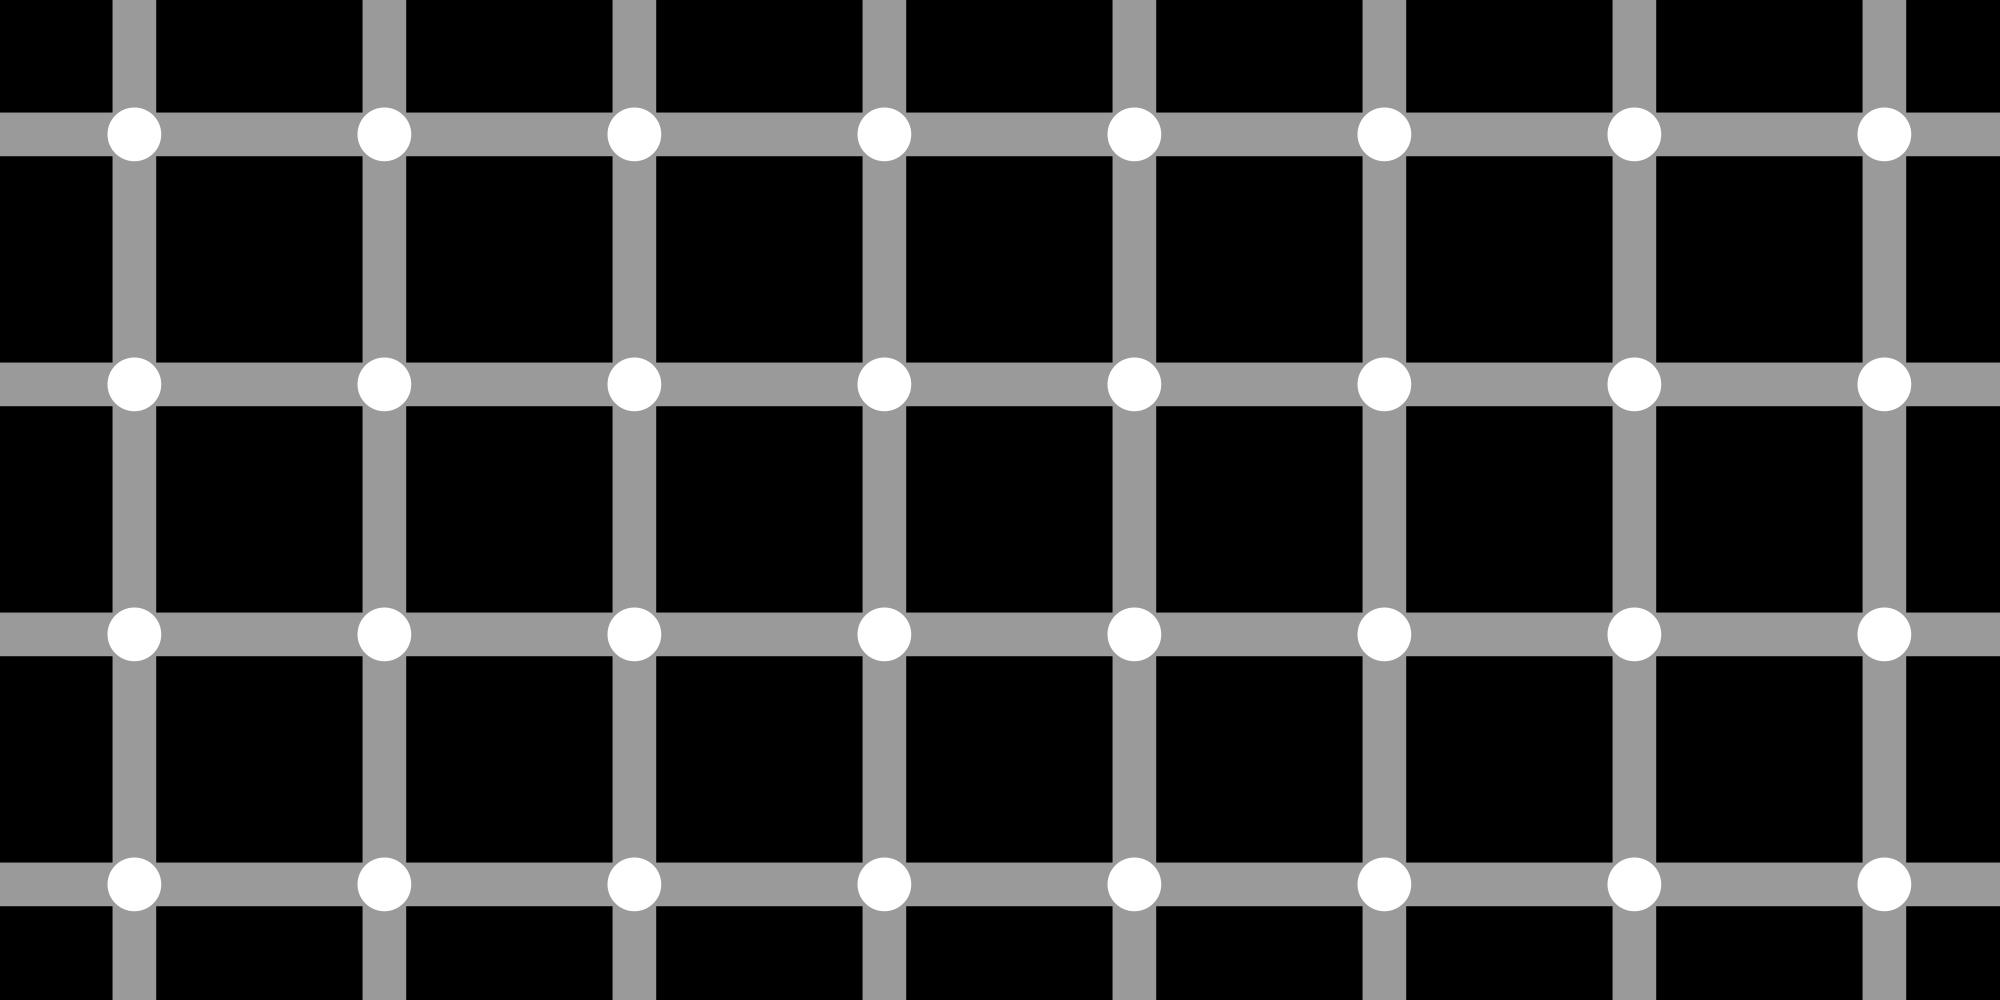 Hermann grid illusion.